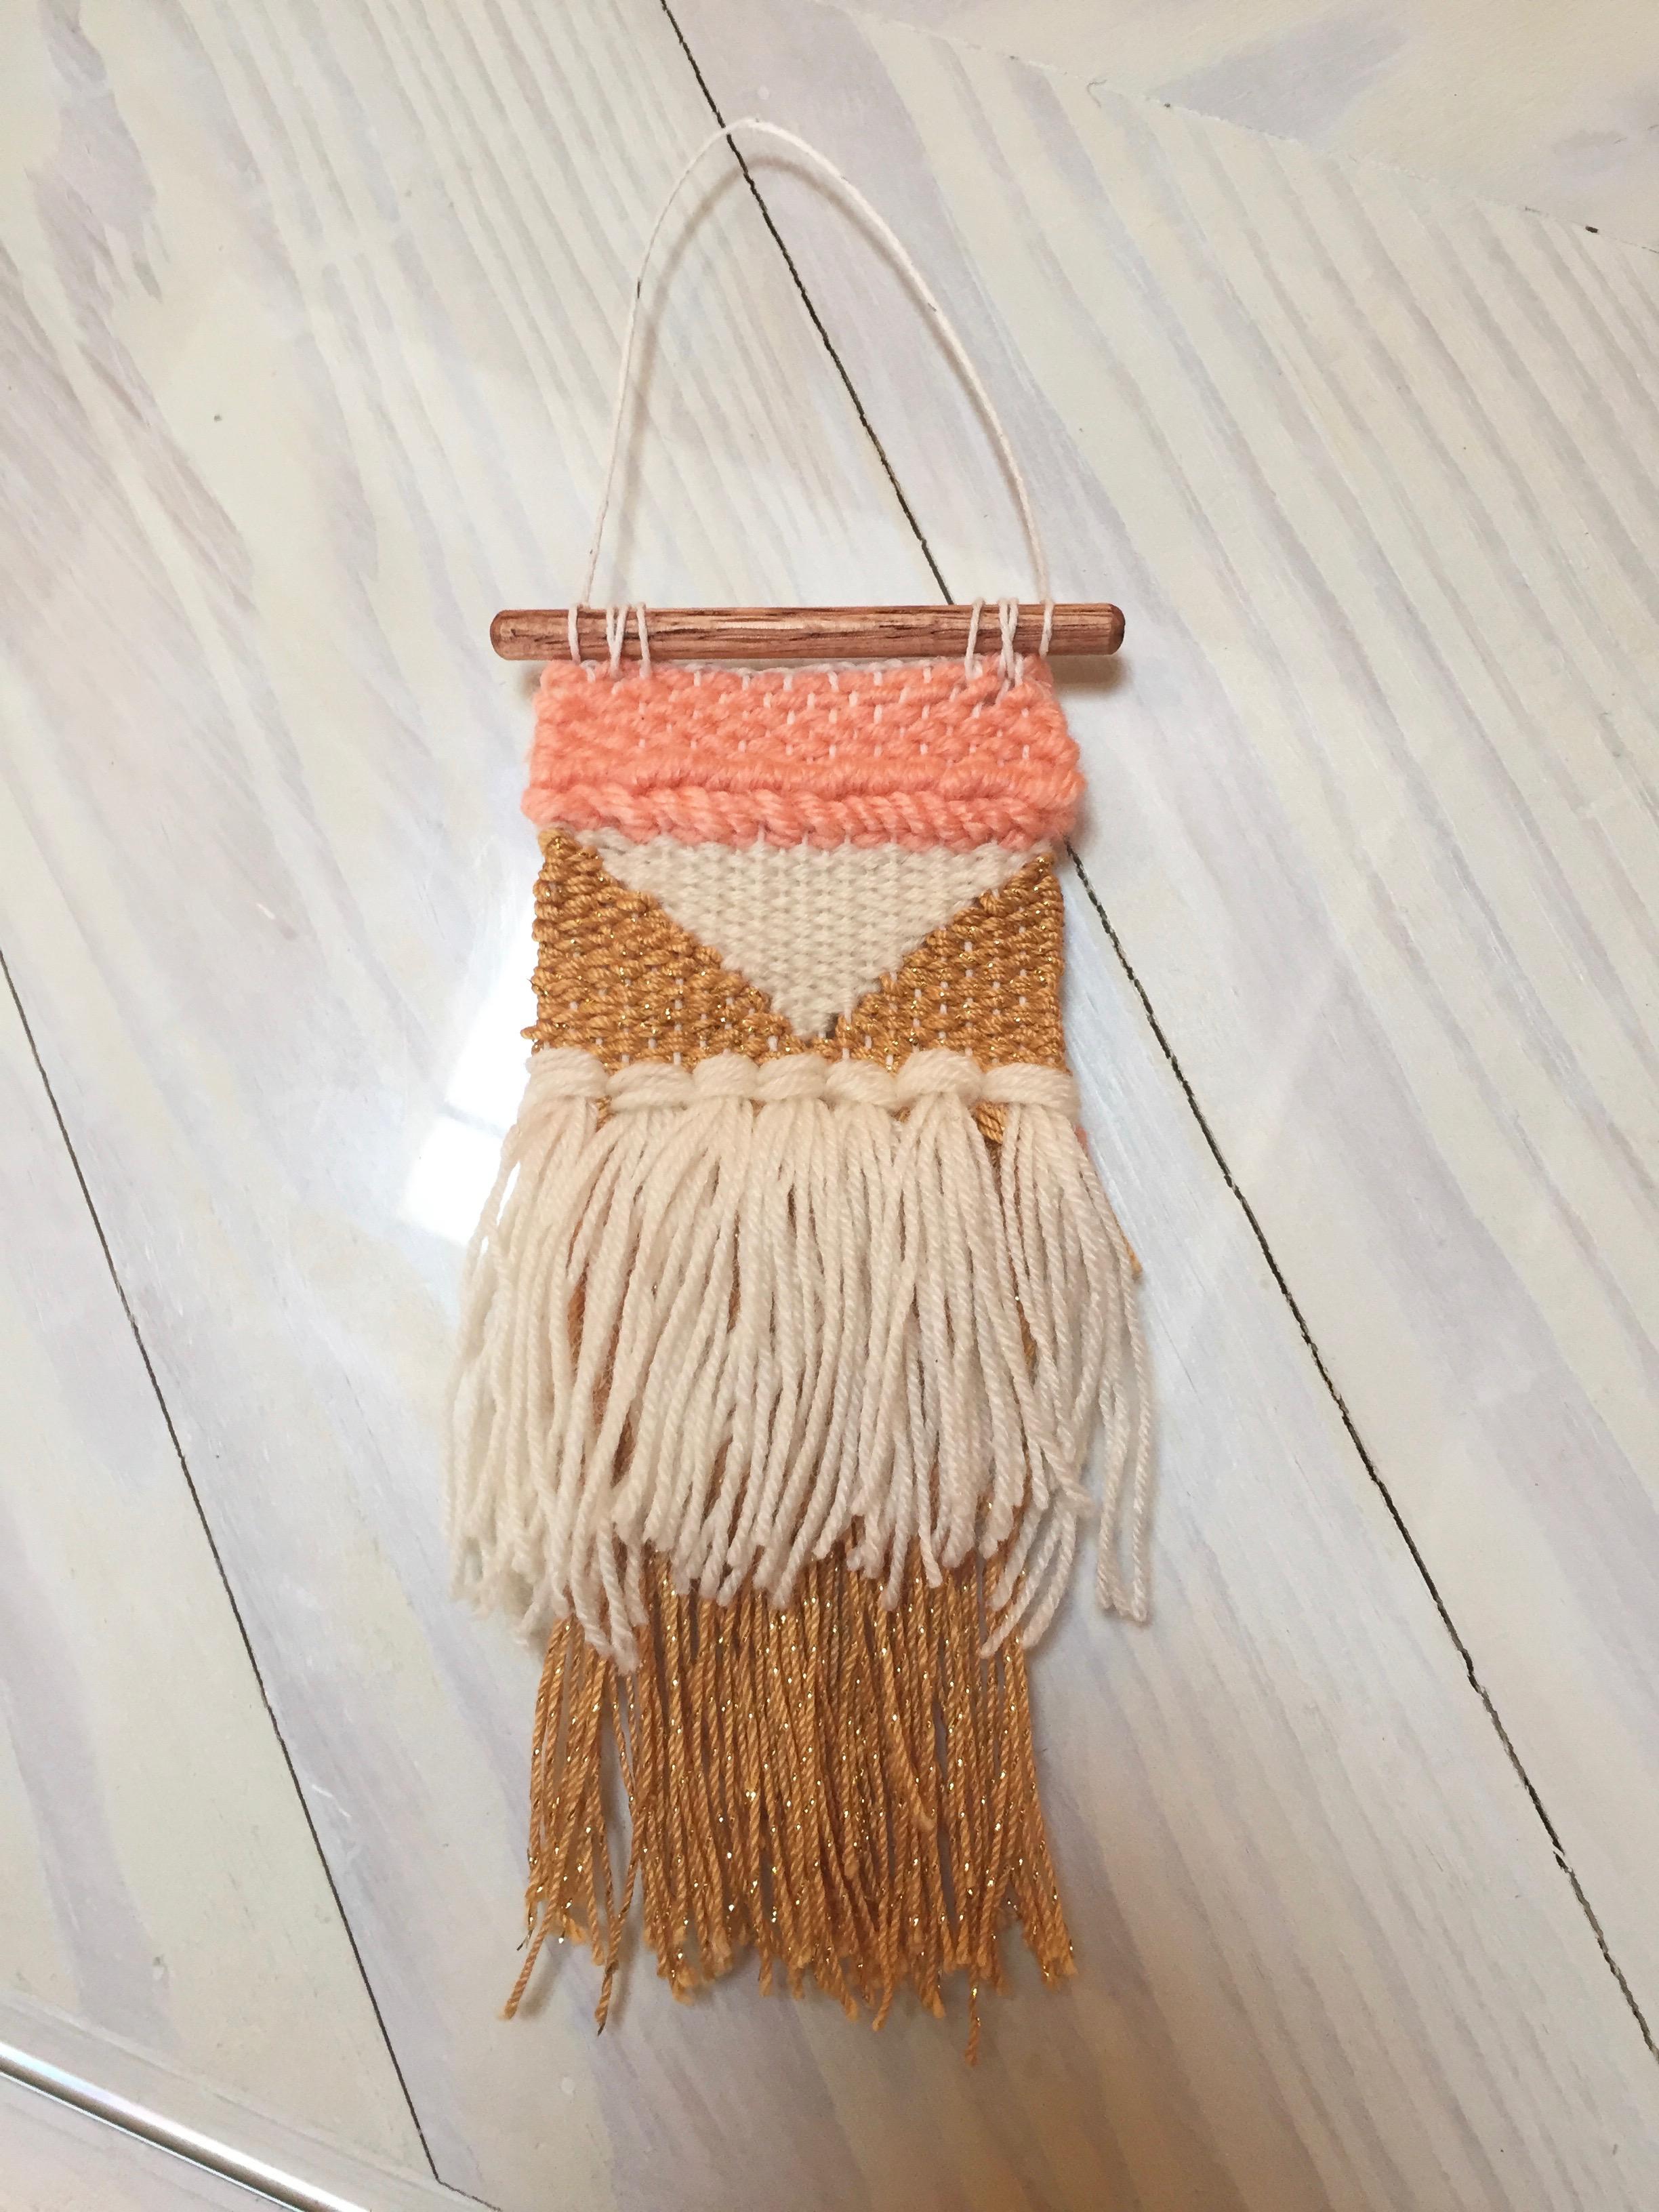 Ta da! My finished mini weaving!